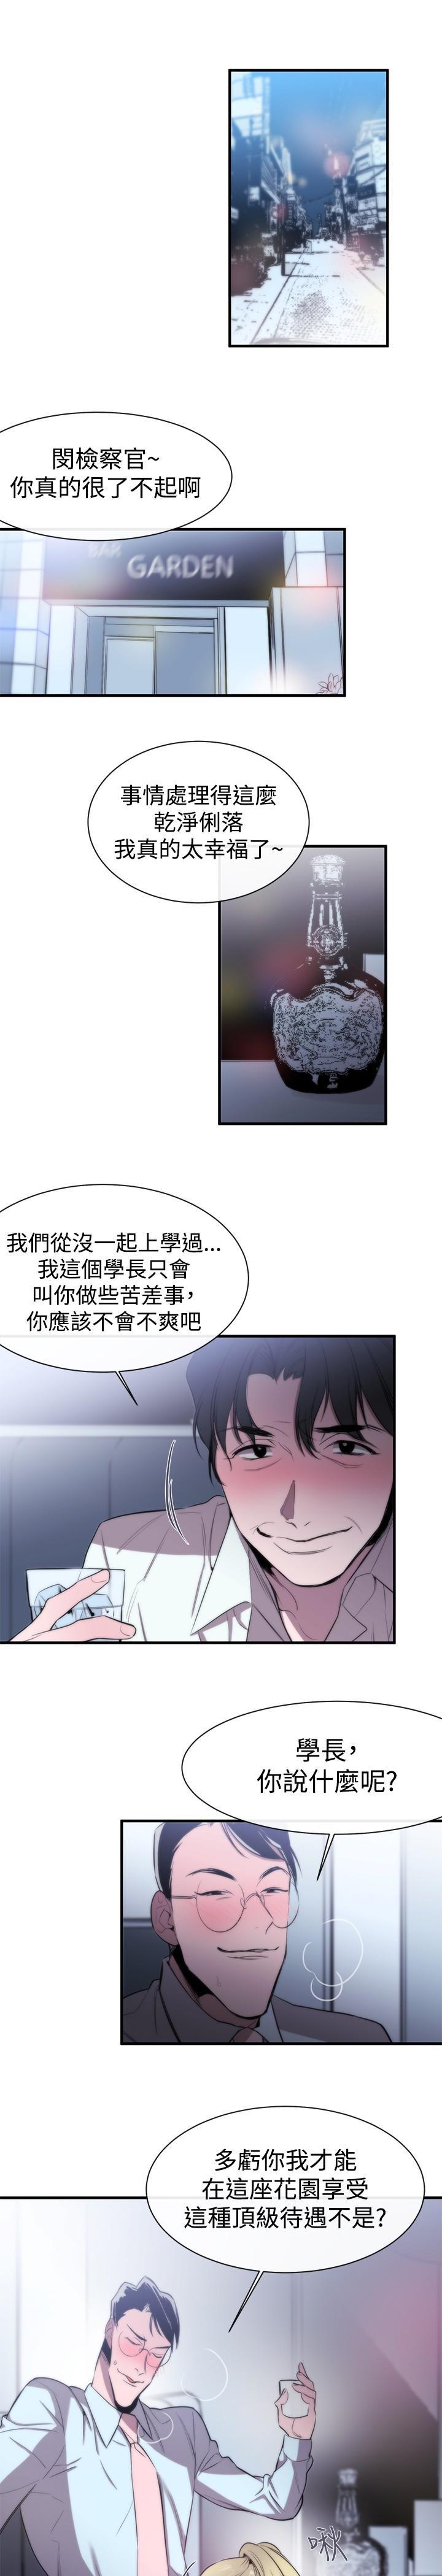 Female Disciple 女助教 Ch.1~8 [Chinese]中文 256